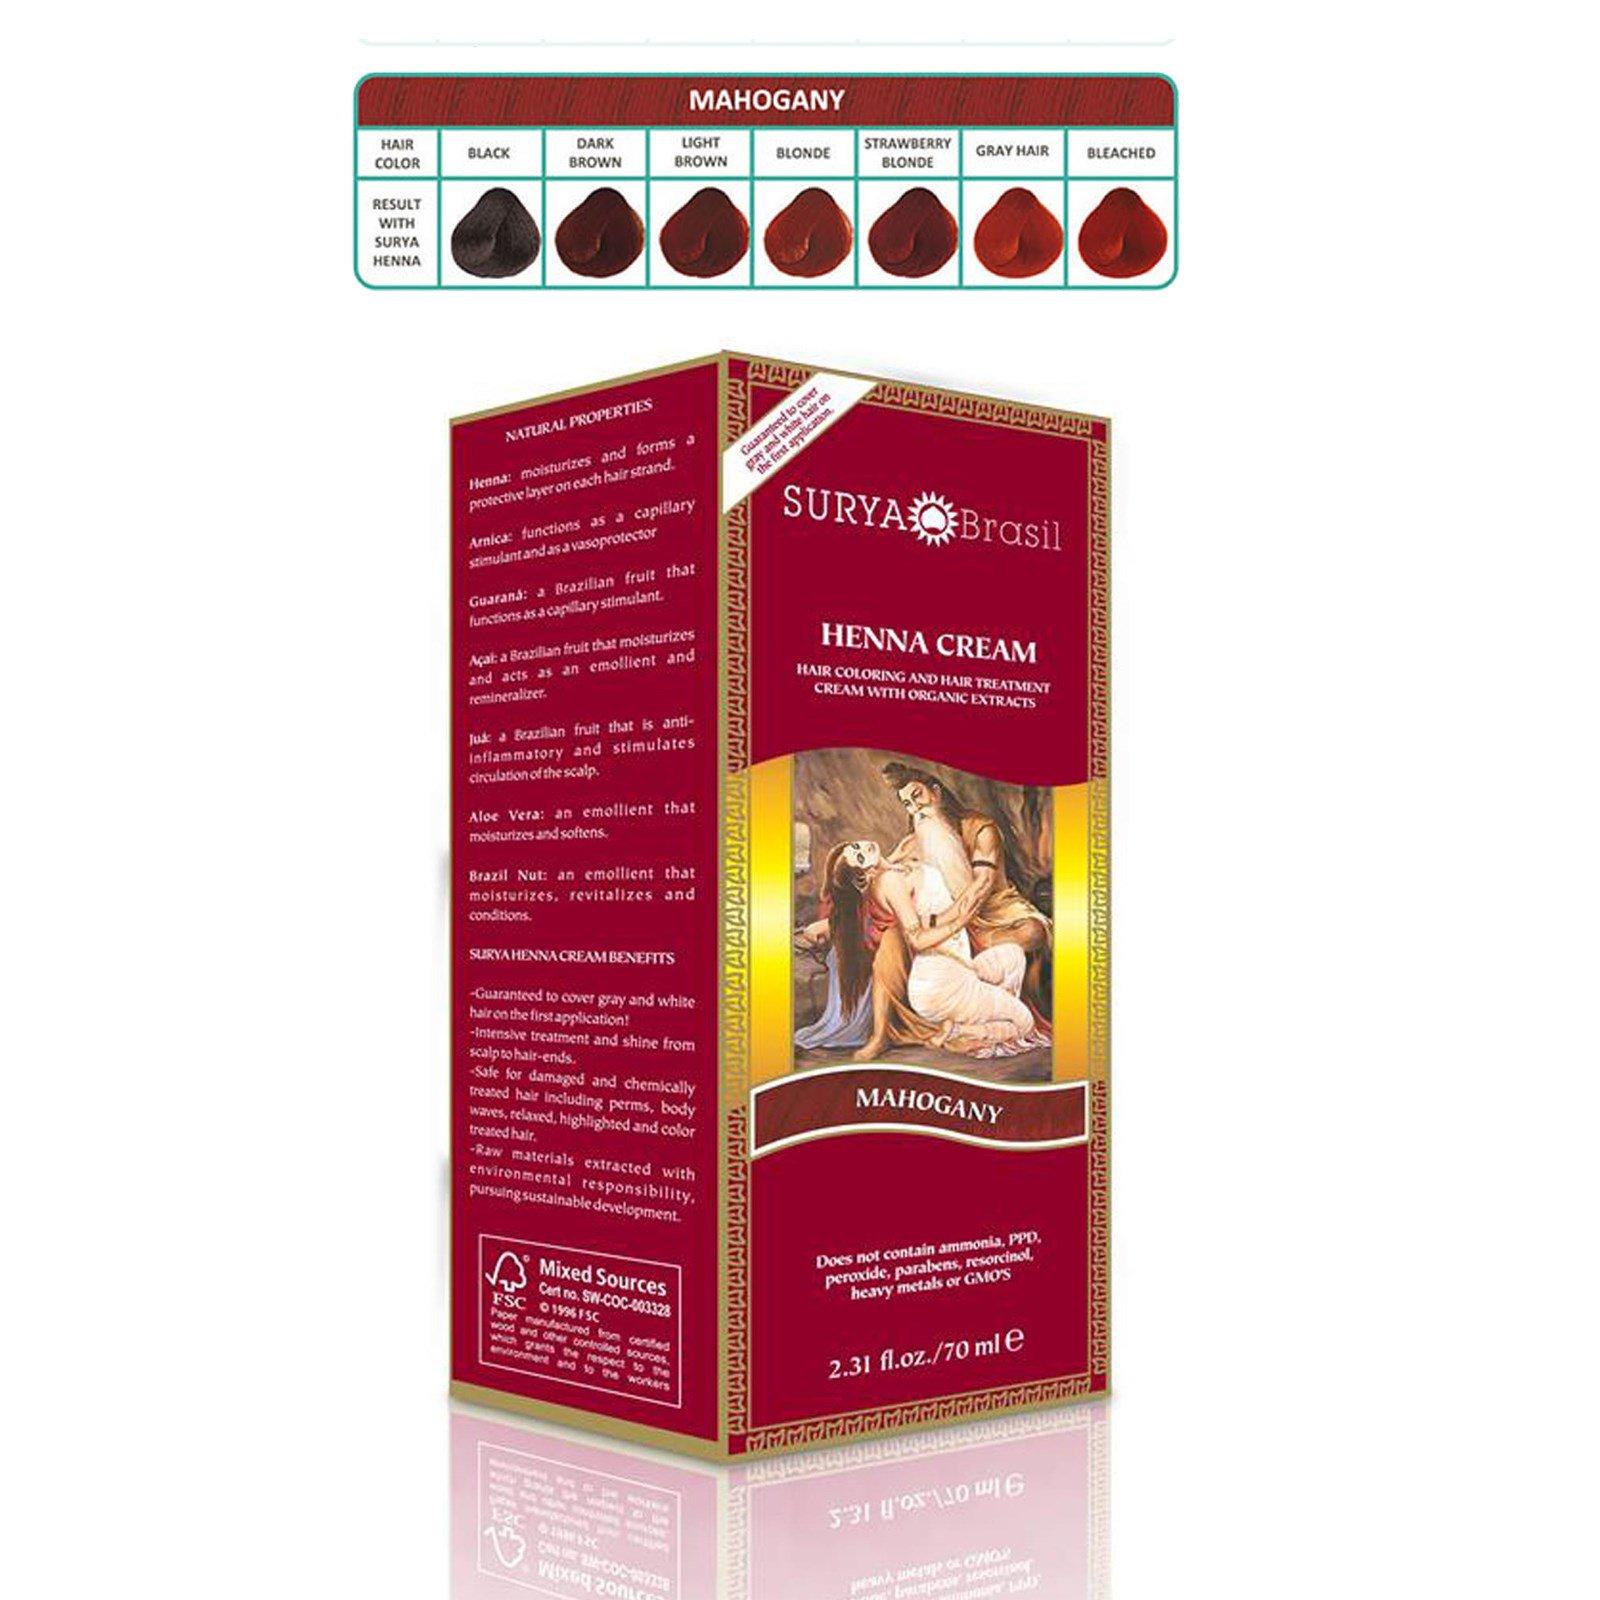 d557e7223c6b7 Surya Brasil, Brasil Cream, Hair Coloring & Hair Treatment, Mahogany, 2.31  fl oz (70 ml) (Discontinued Item)